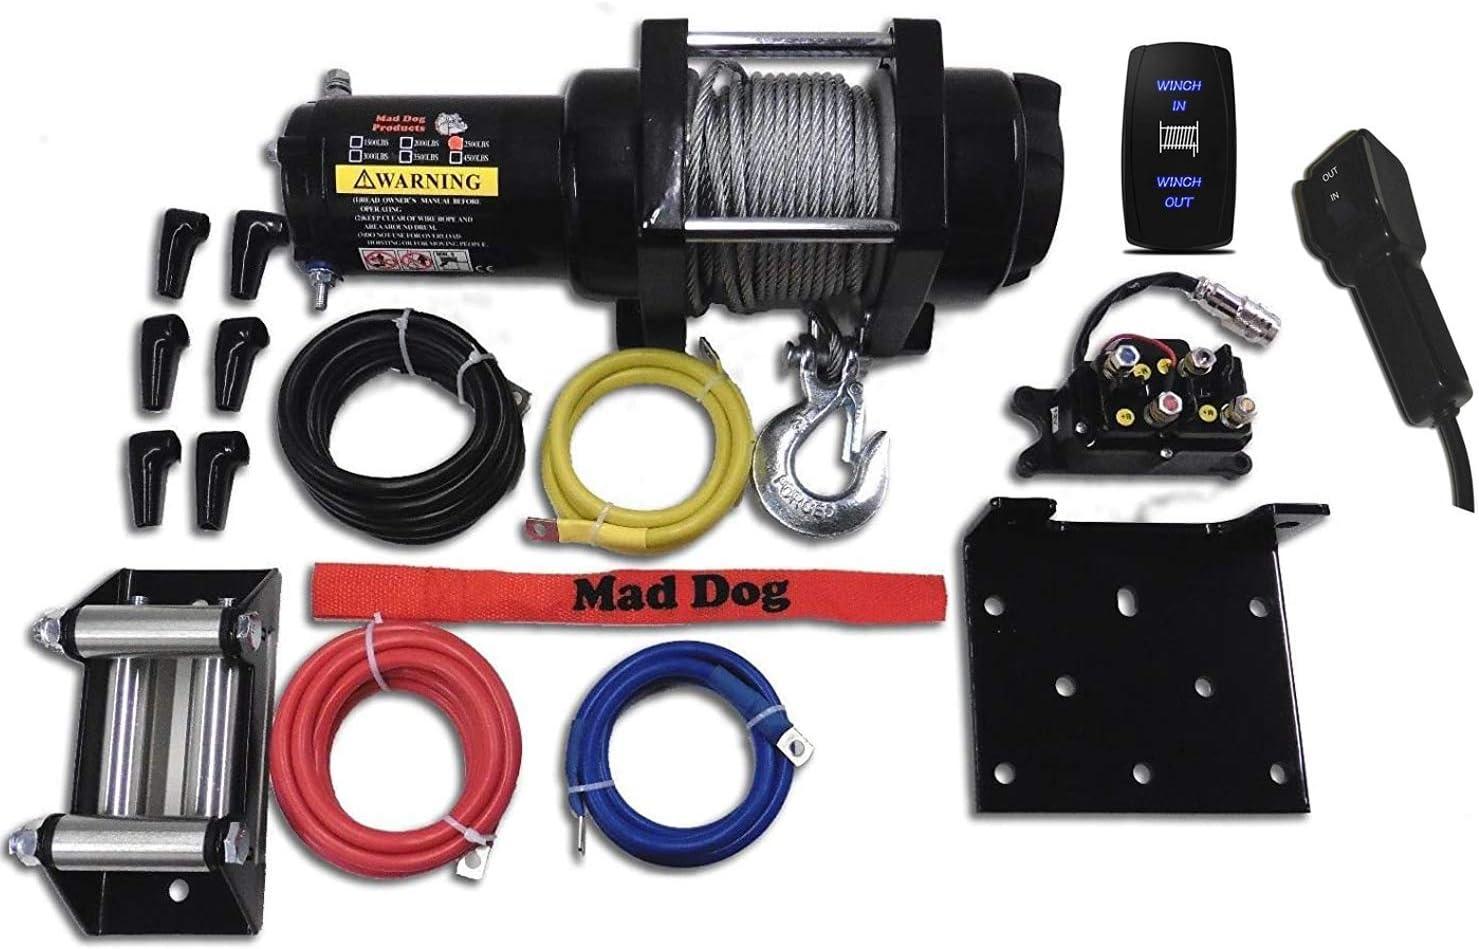 Mad Dog 3500lb Winch Mount Combo Polaris 2015-2020 900 1000 RZR//RZR S//RZR XP